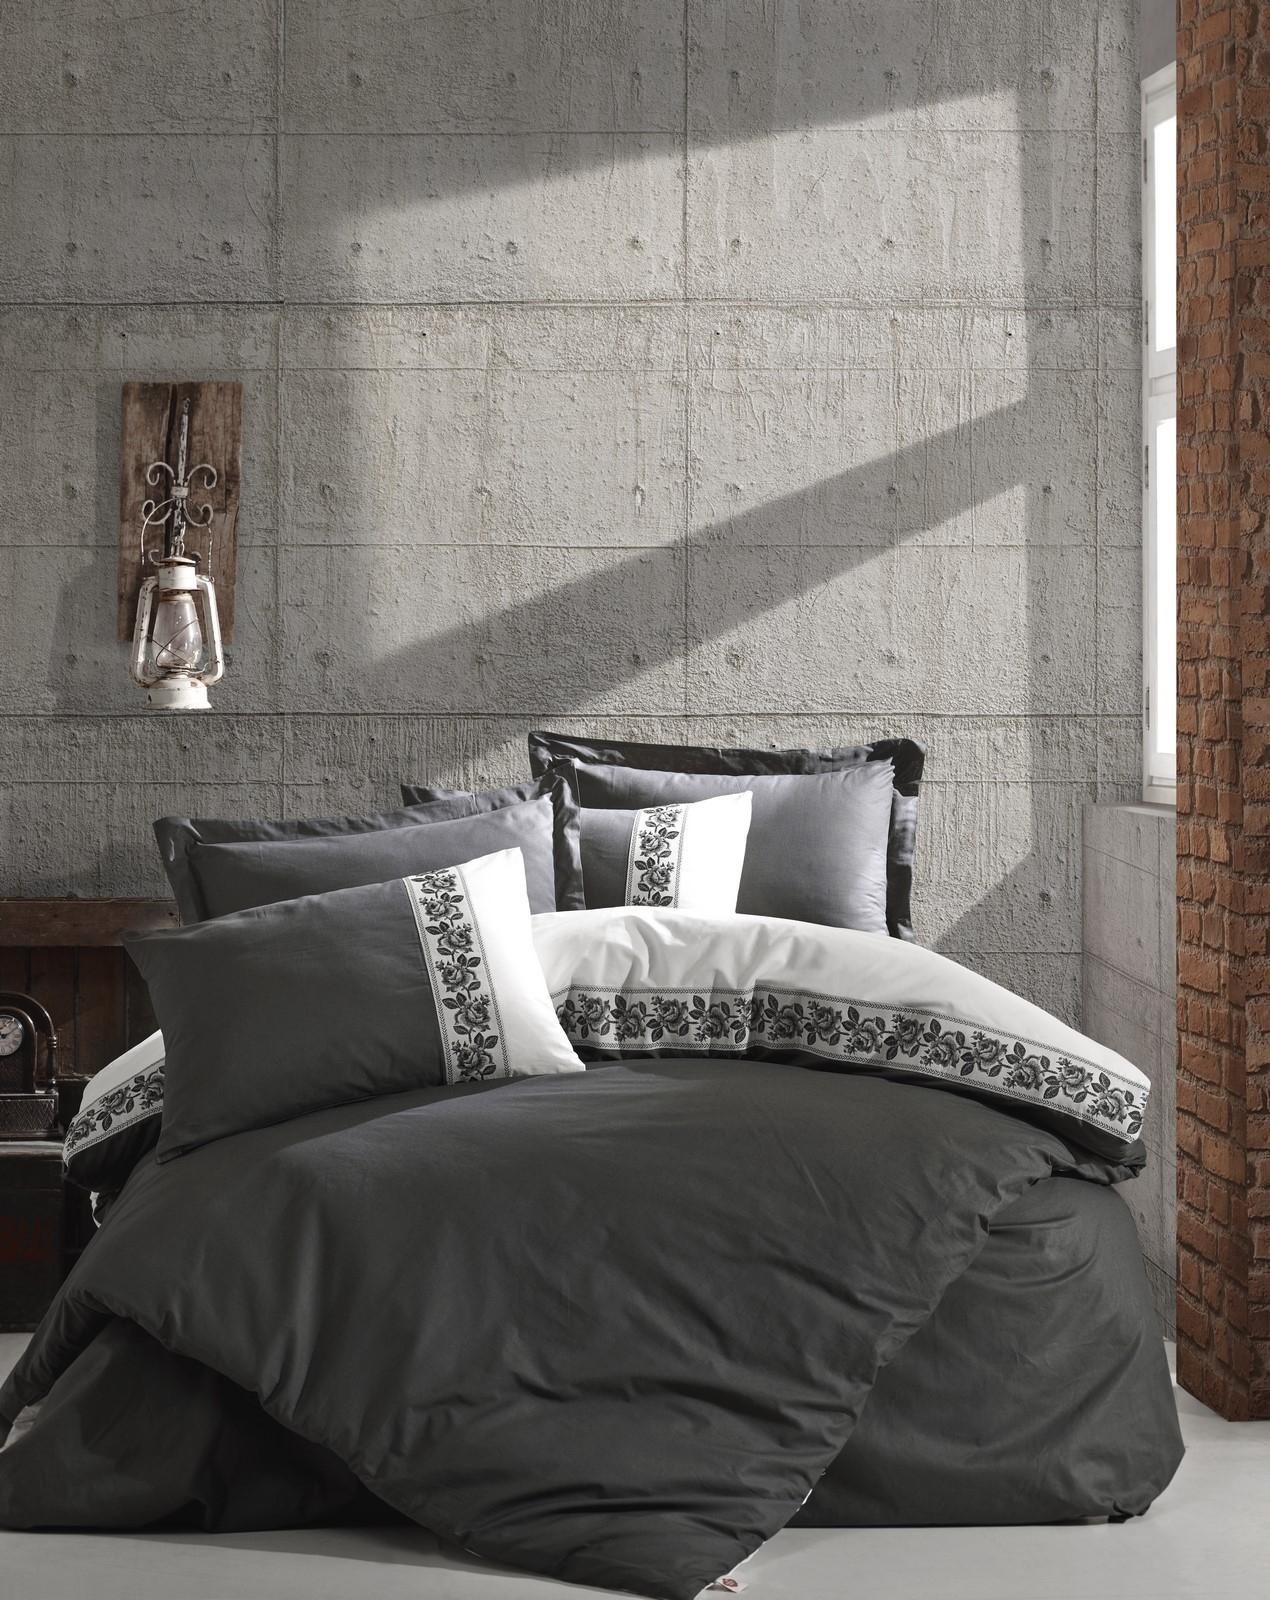 Lenjerie de pat din bumbac Ranforce, Rosinda Gri Inchis / Crem, 200 x 220 cm imagine